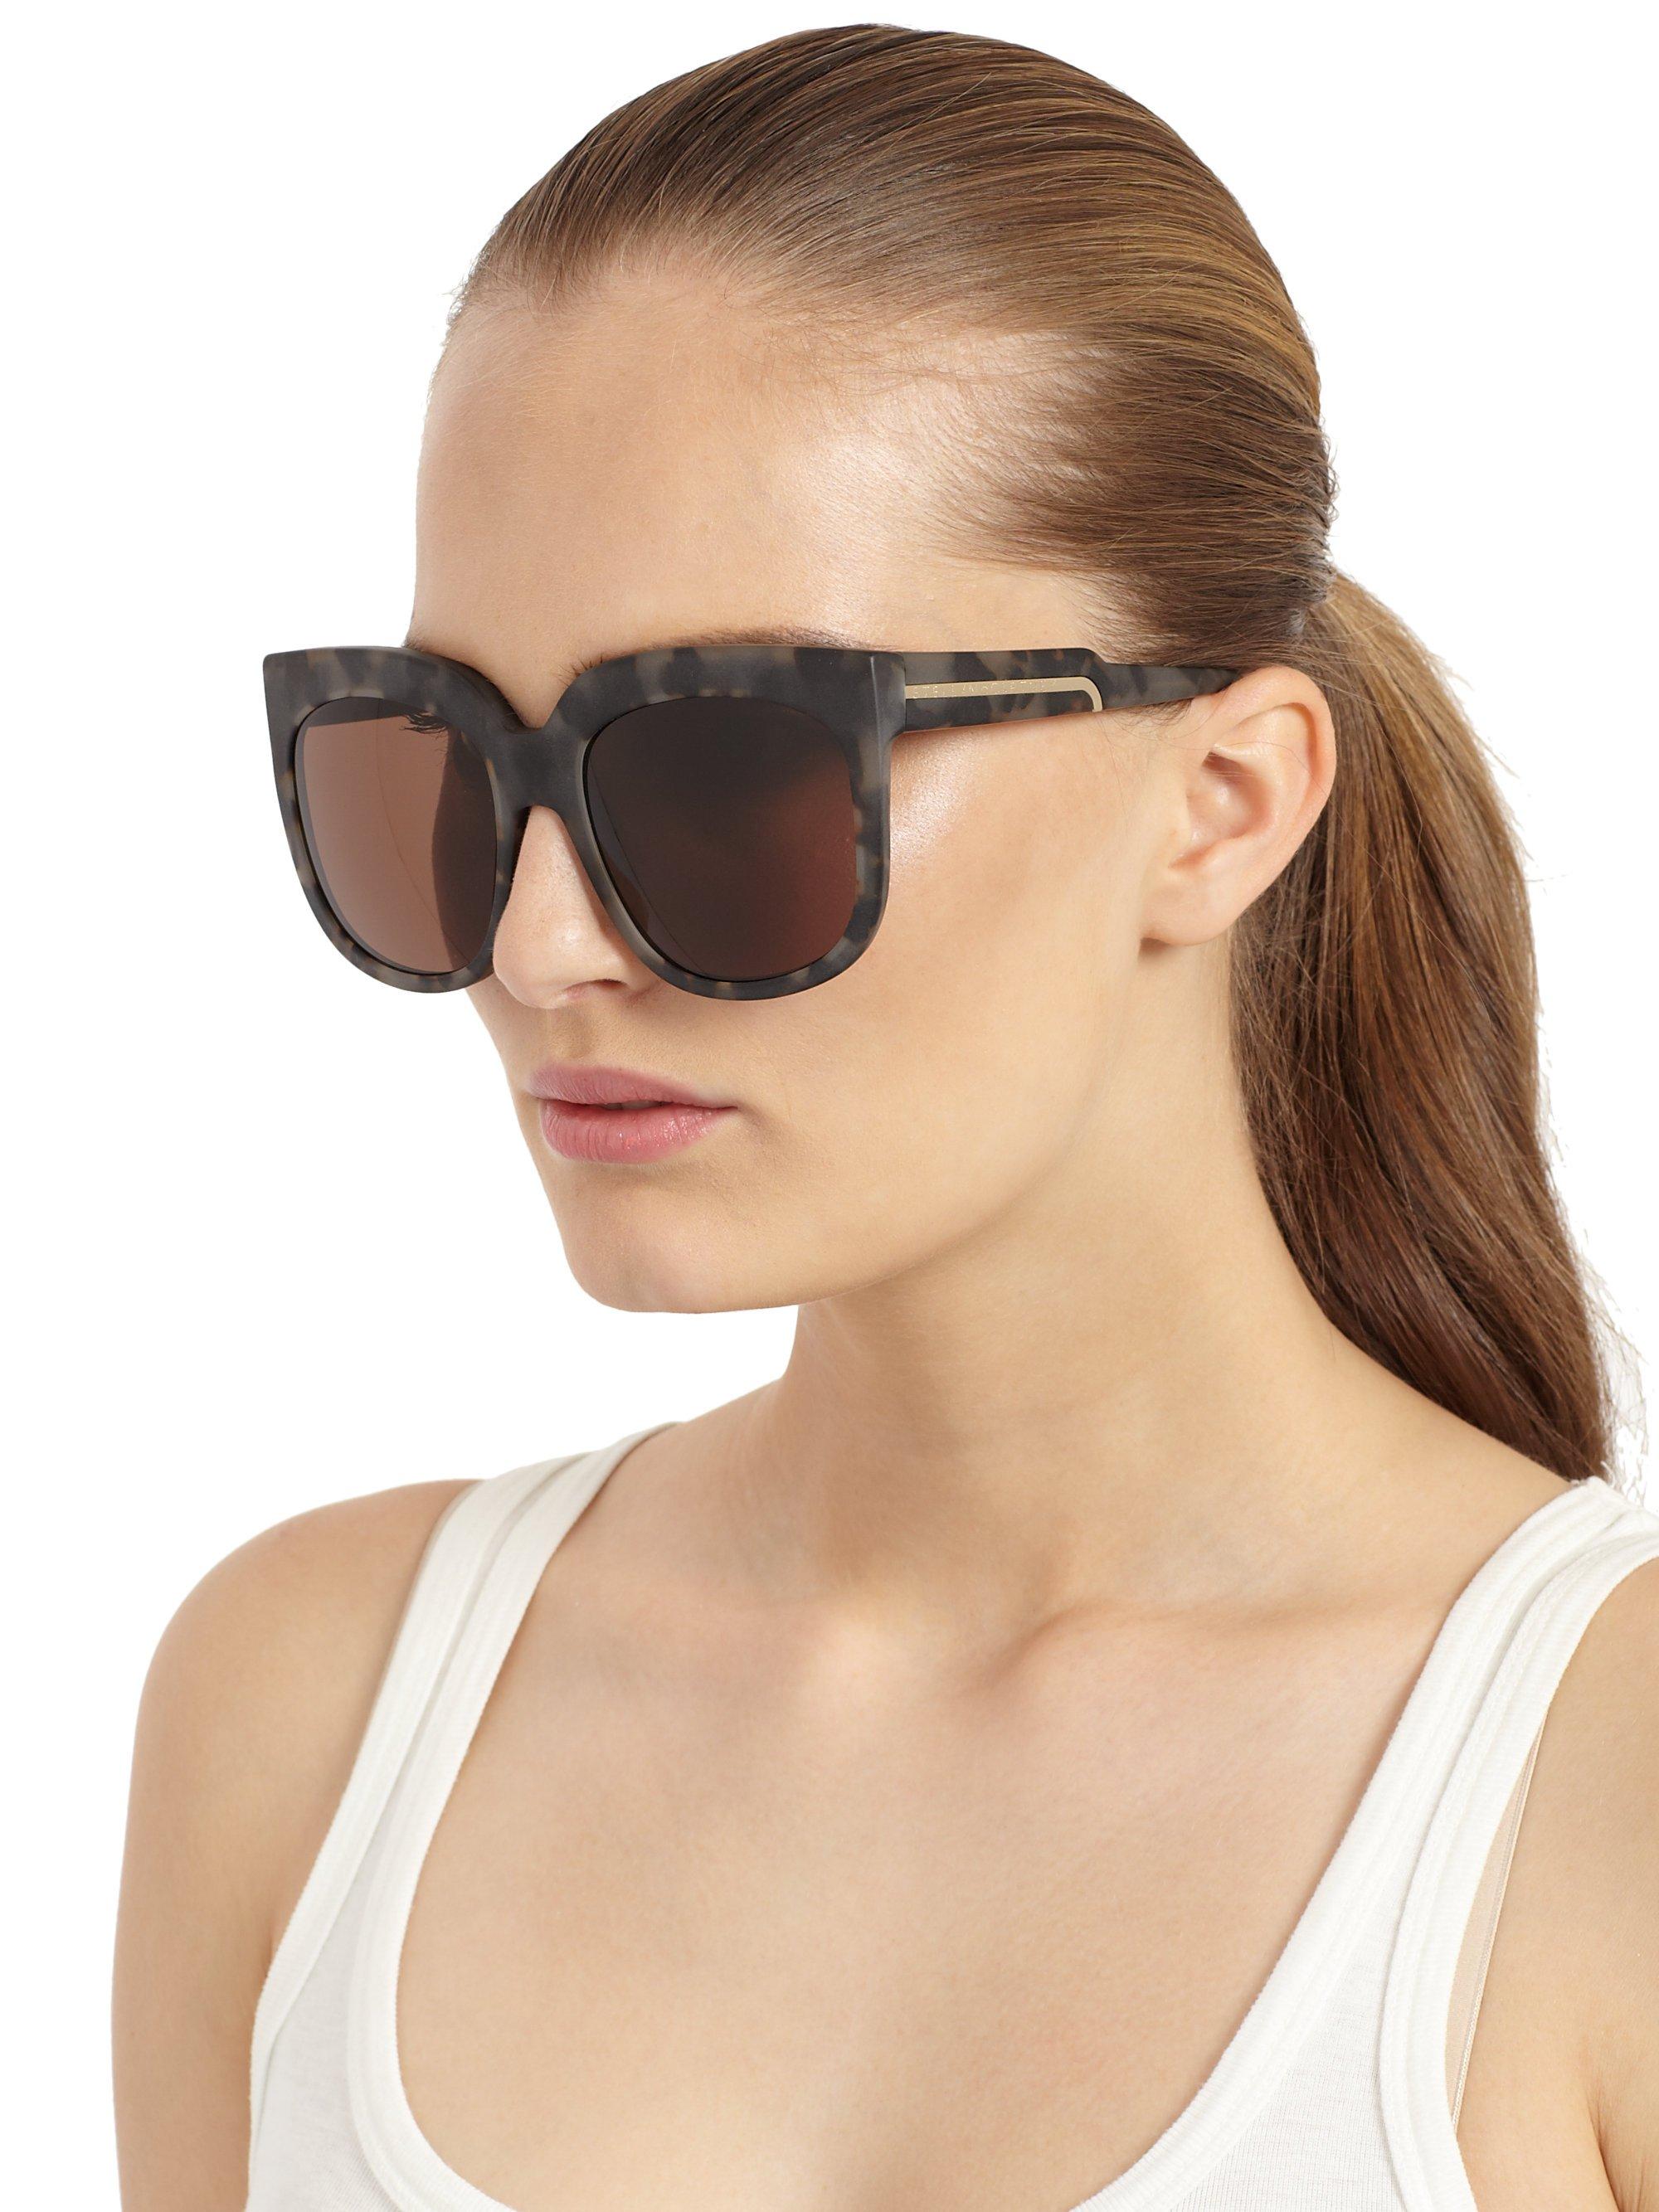 Stella Mccartney Sunglasses  stella mccartney squared cat s eye sunglasses in gray lyst